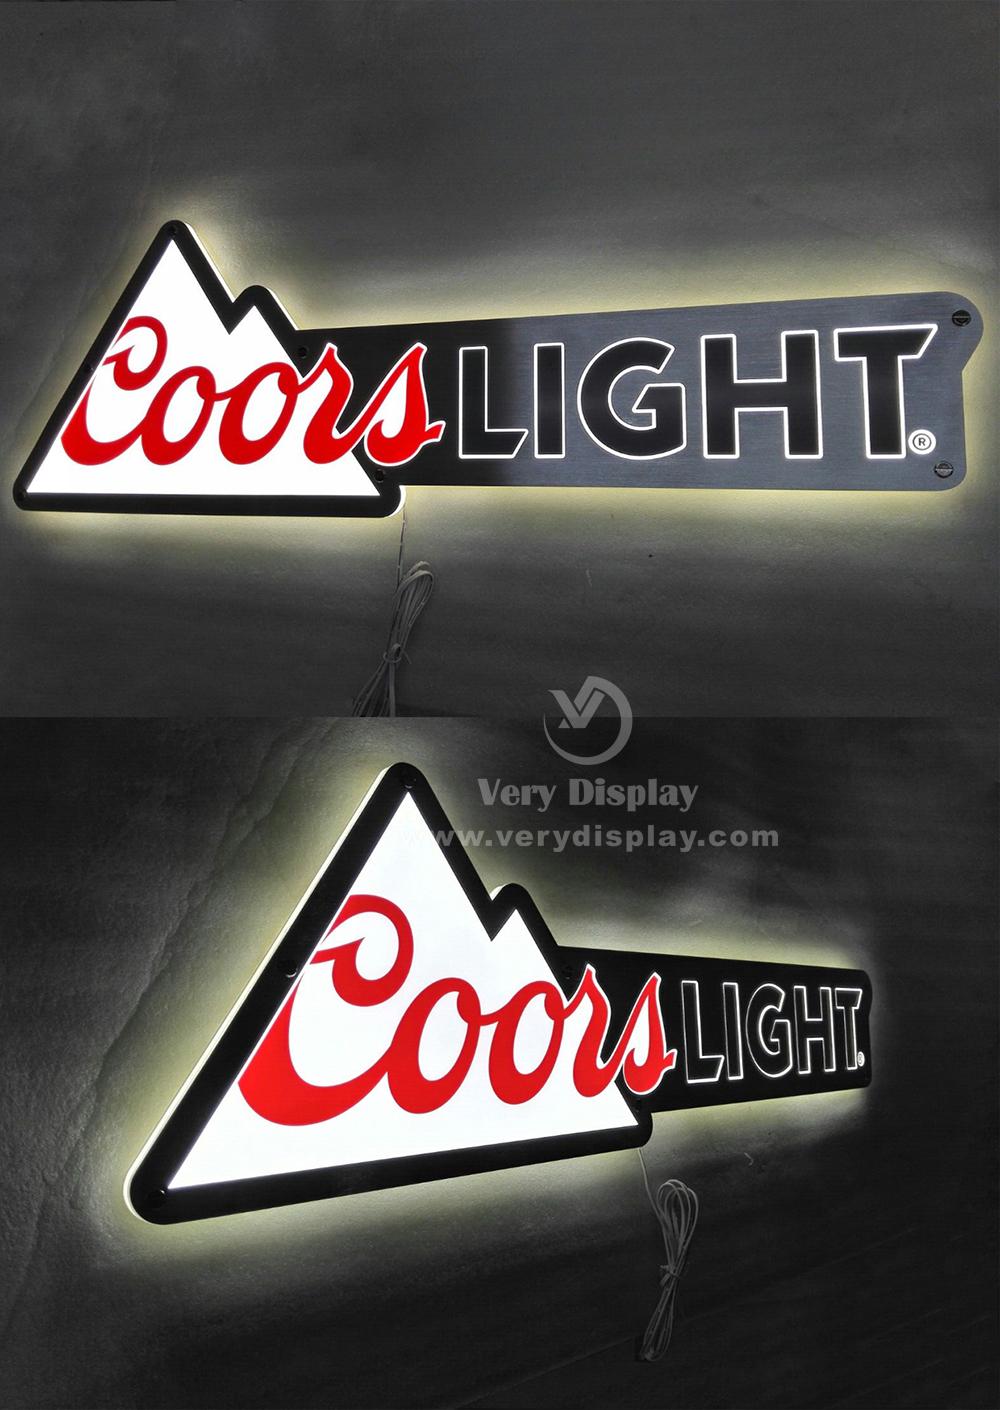 coorslight signs